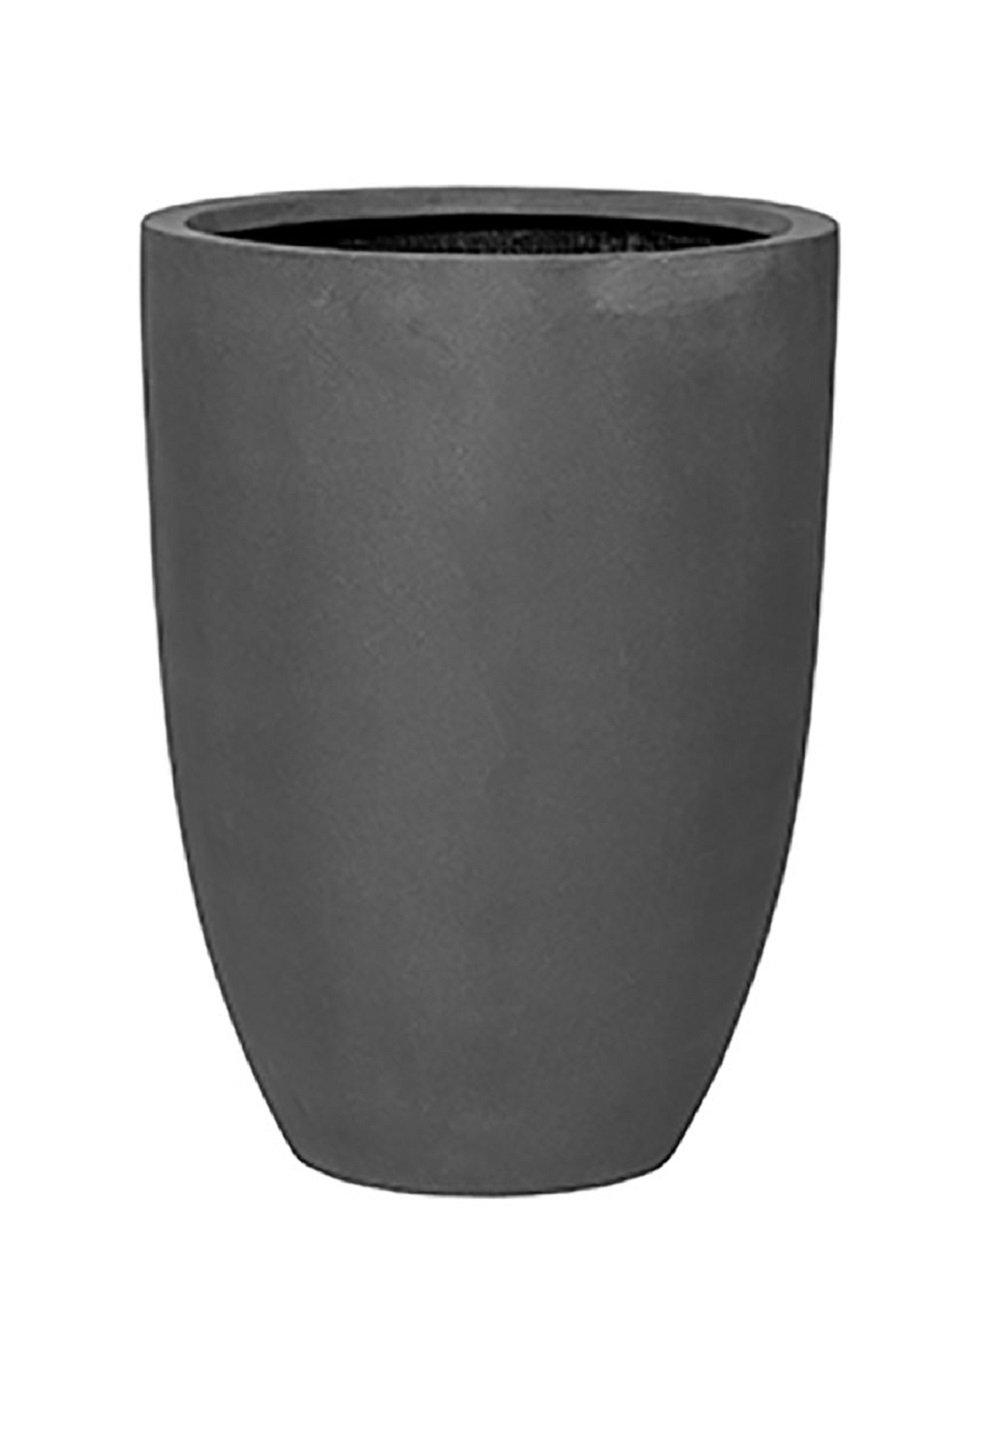 Pottery Pots Ben Tall Grey Flower Planter Tapered Cylinder Fiberstone Vase 22'' H x 16'' W